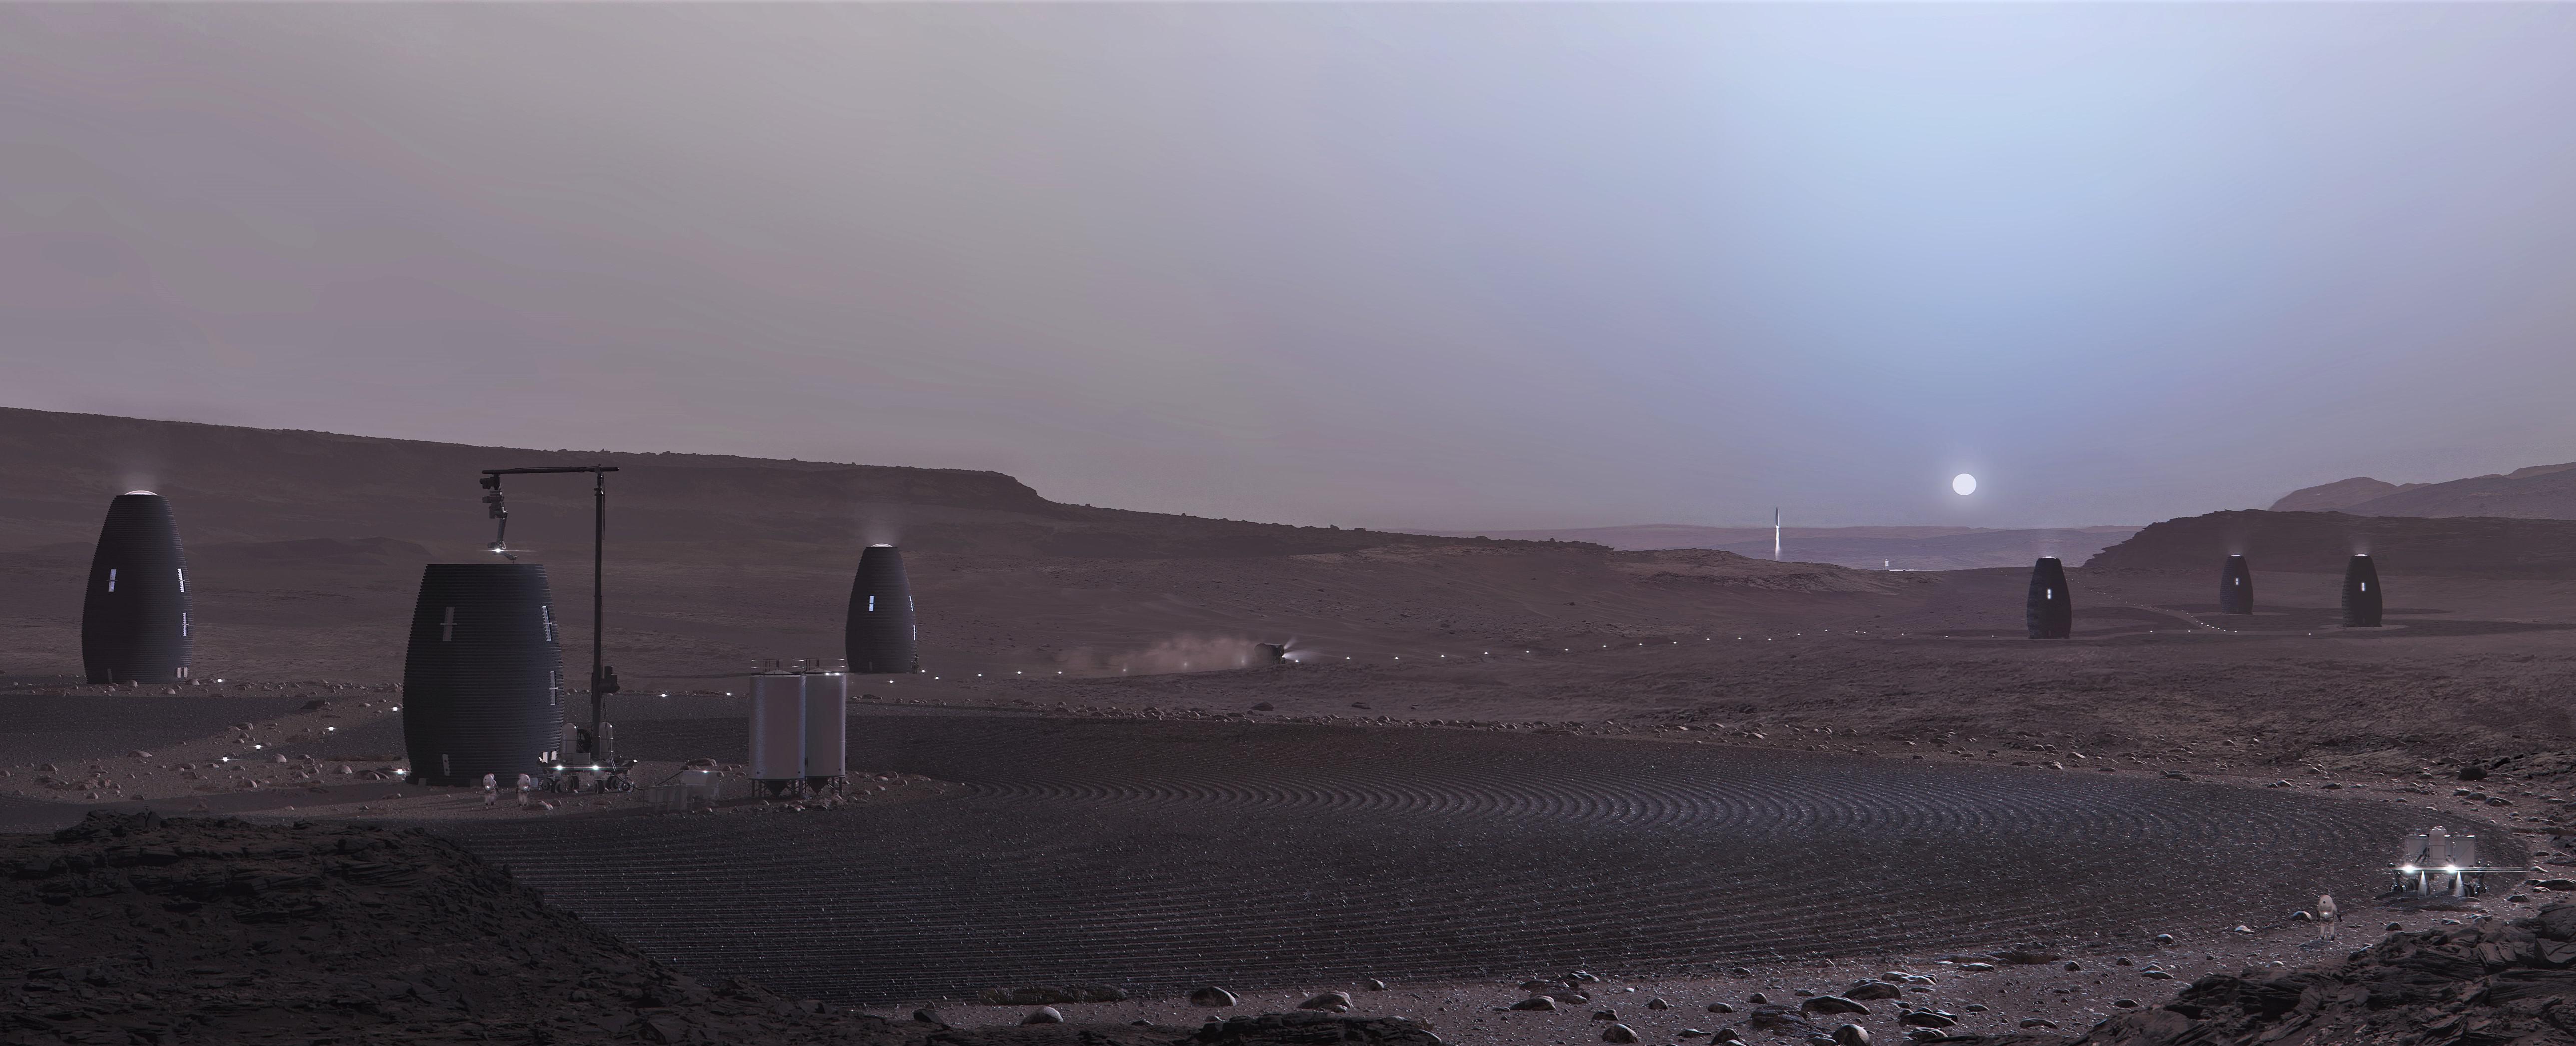 MARSHA Mars habitat colony (AI Space Factory) 1 crop 3